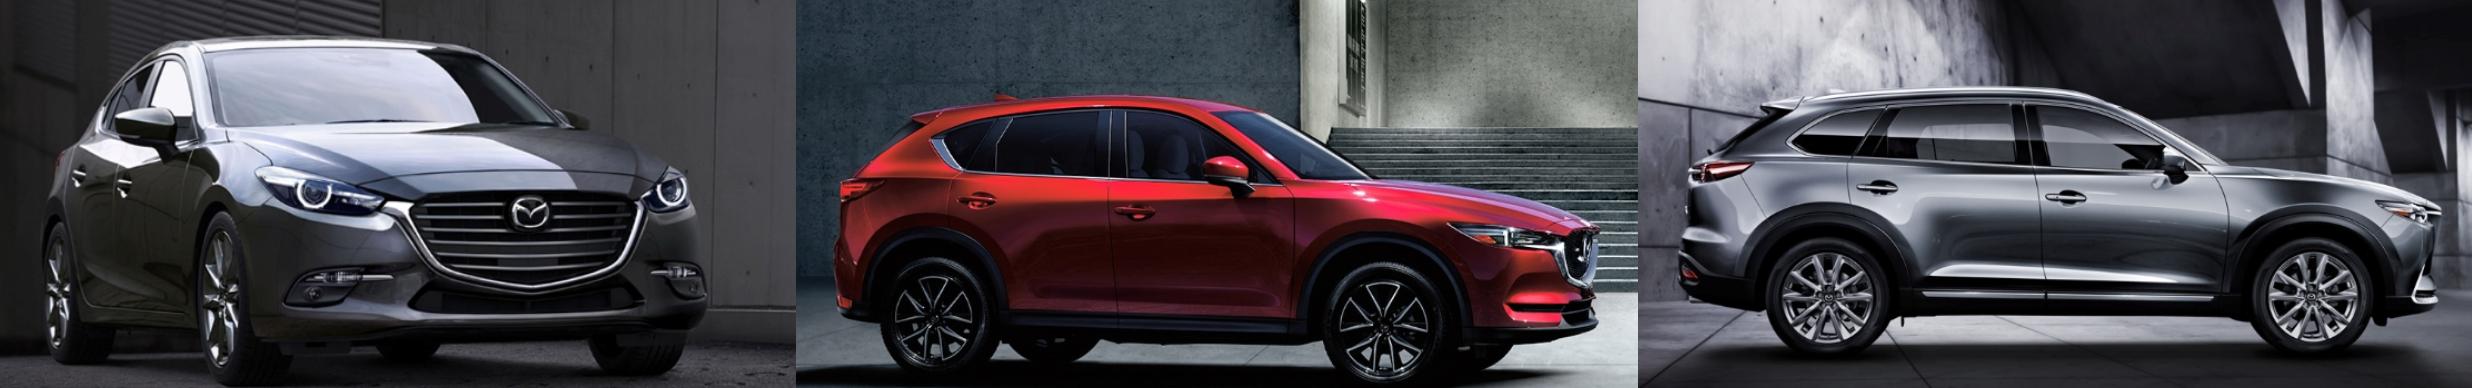 2017 Mazda Lineup